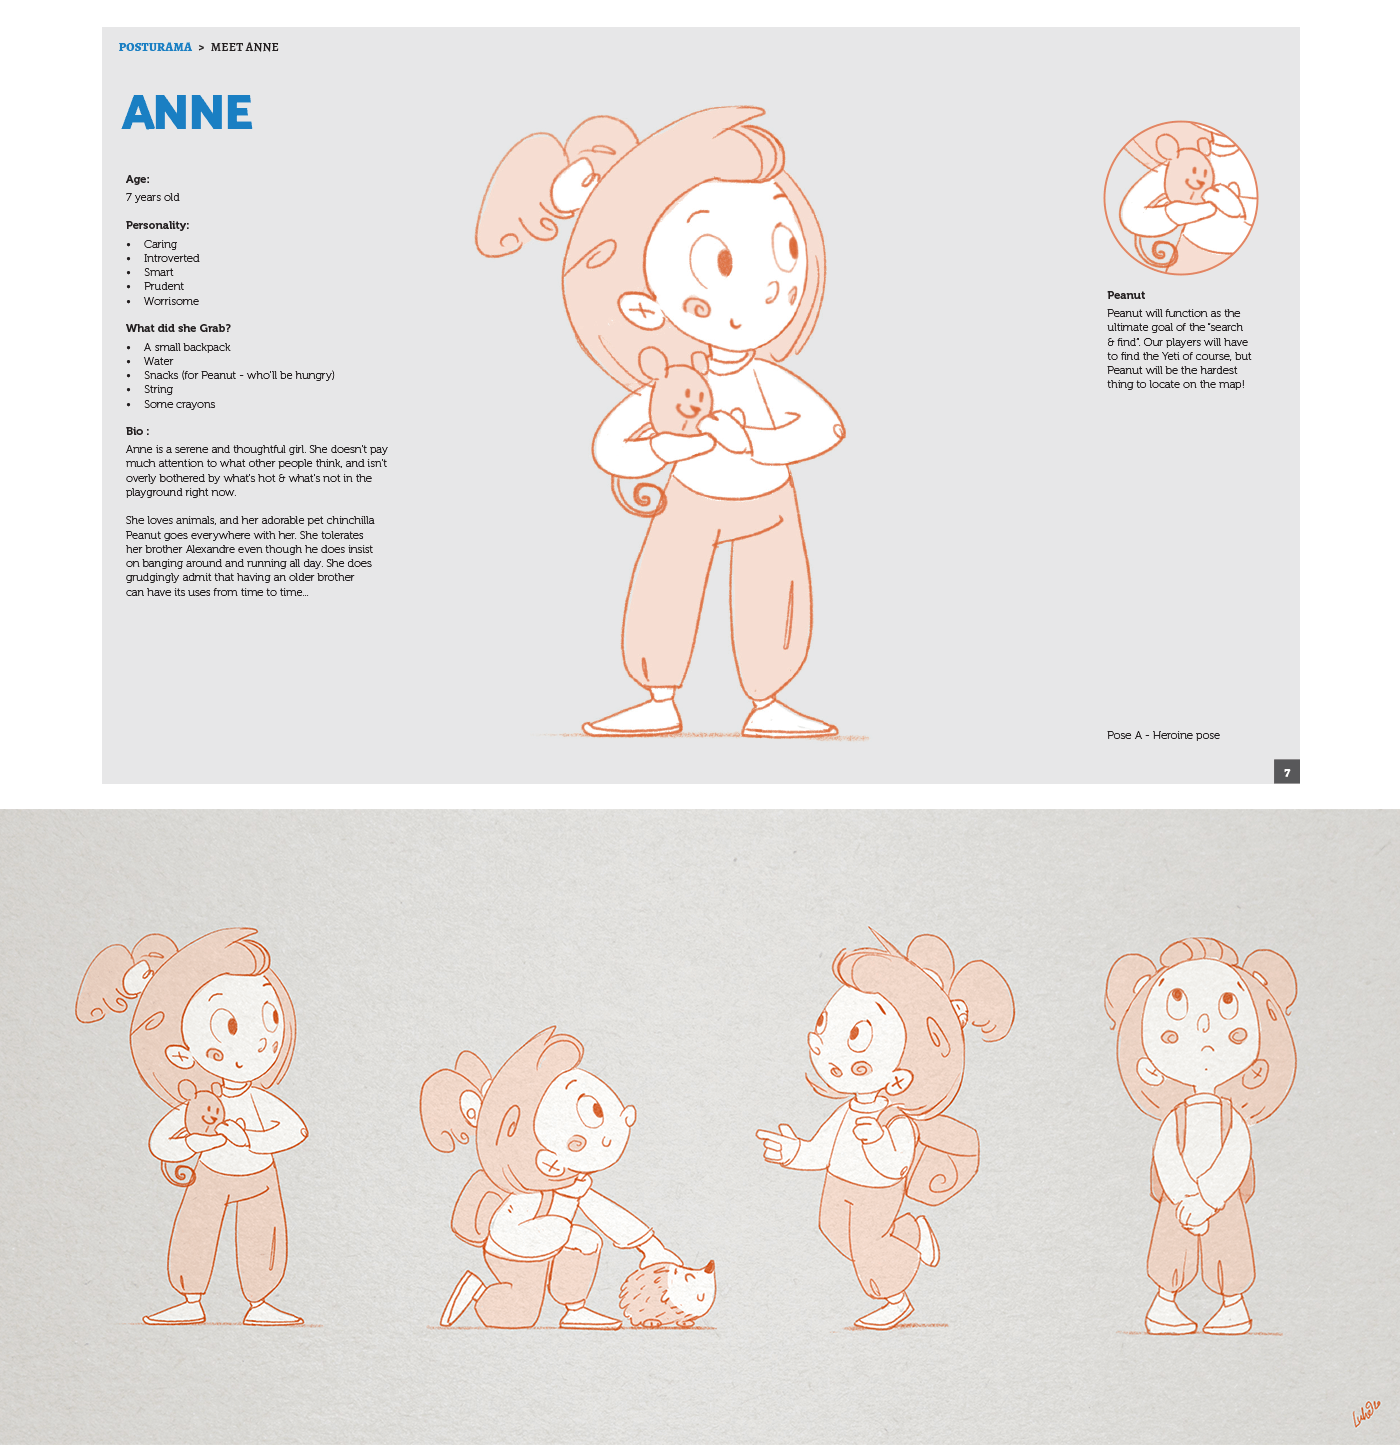 art direction  character illustration Digital Art  ILLUSTRATION  Illustrator limited palette project development Search & find vector children's illustration